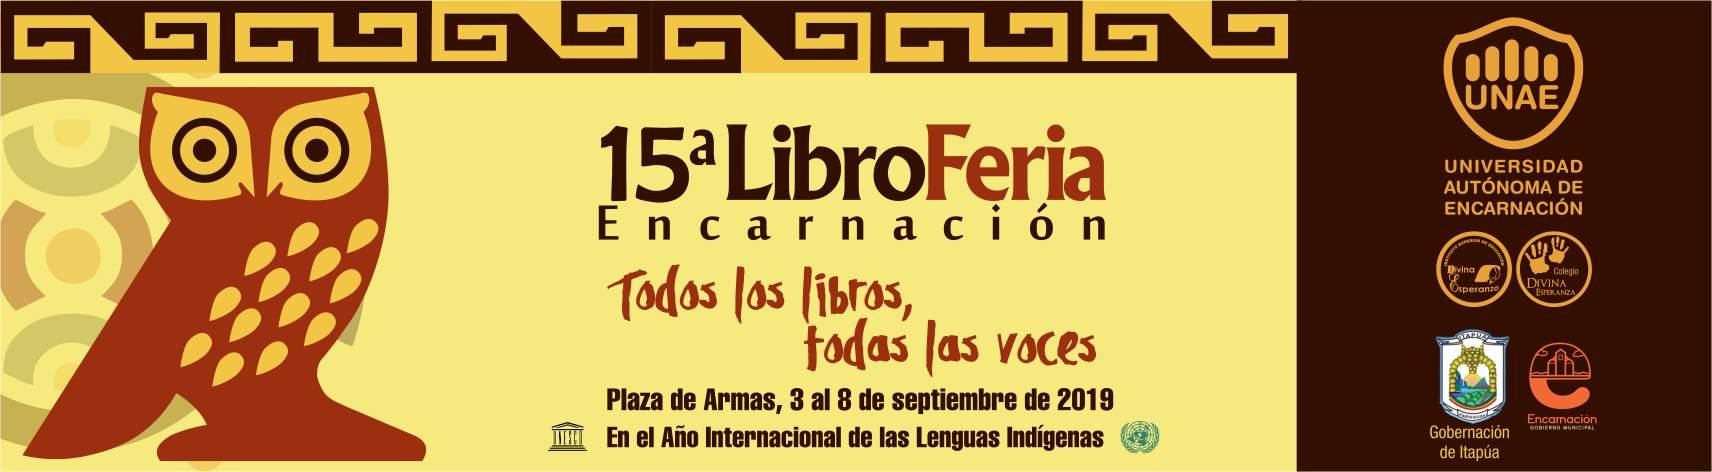 Libroferia-Encarnacion-2019-slider